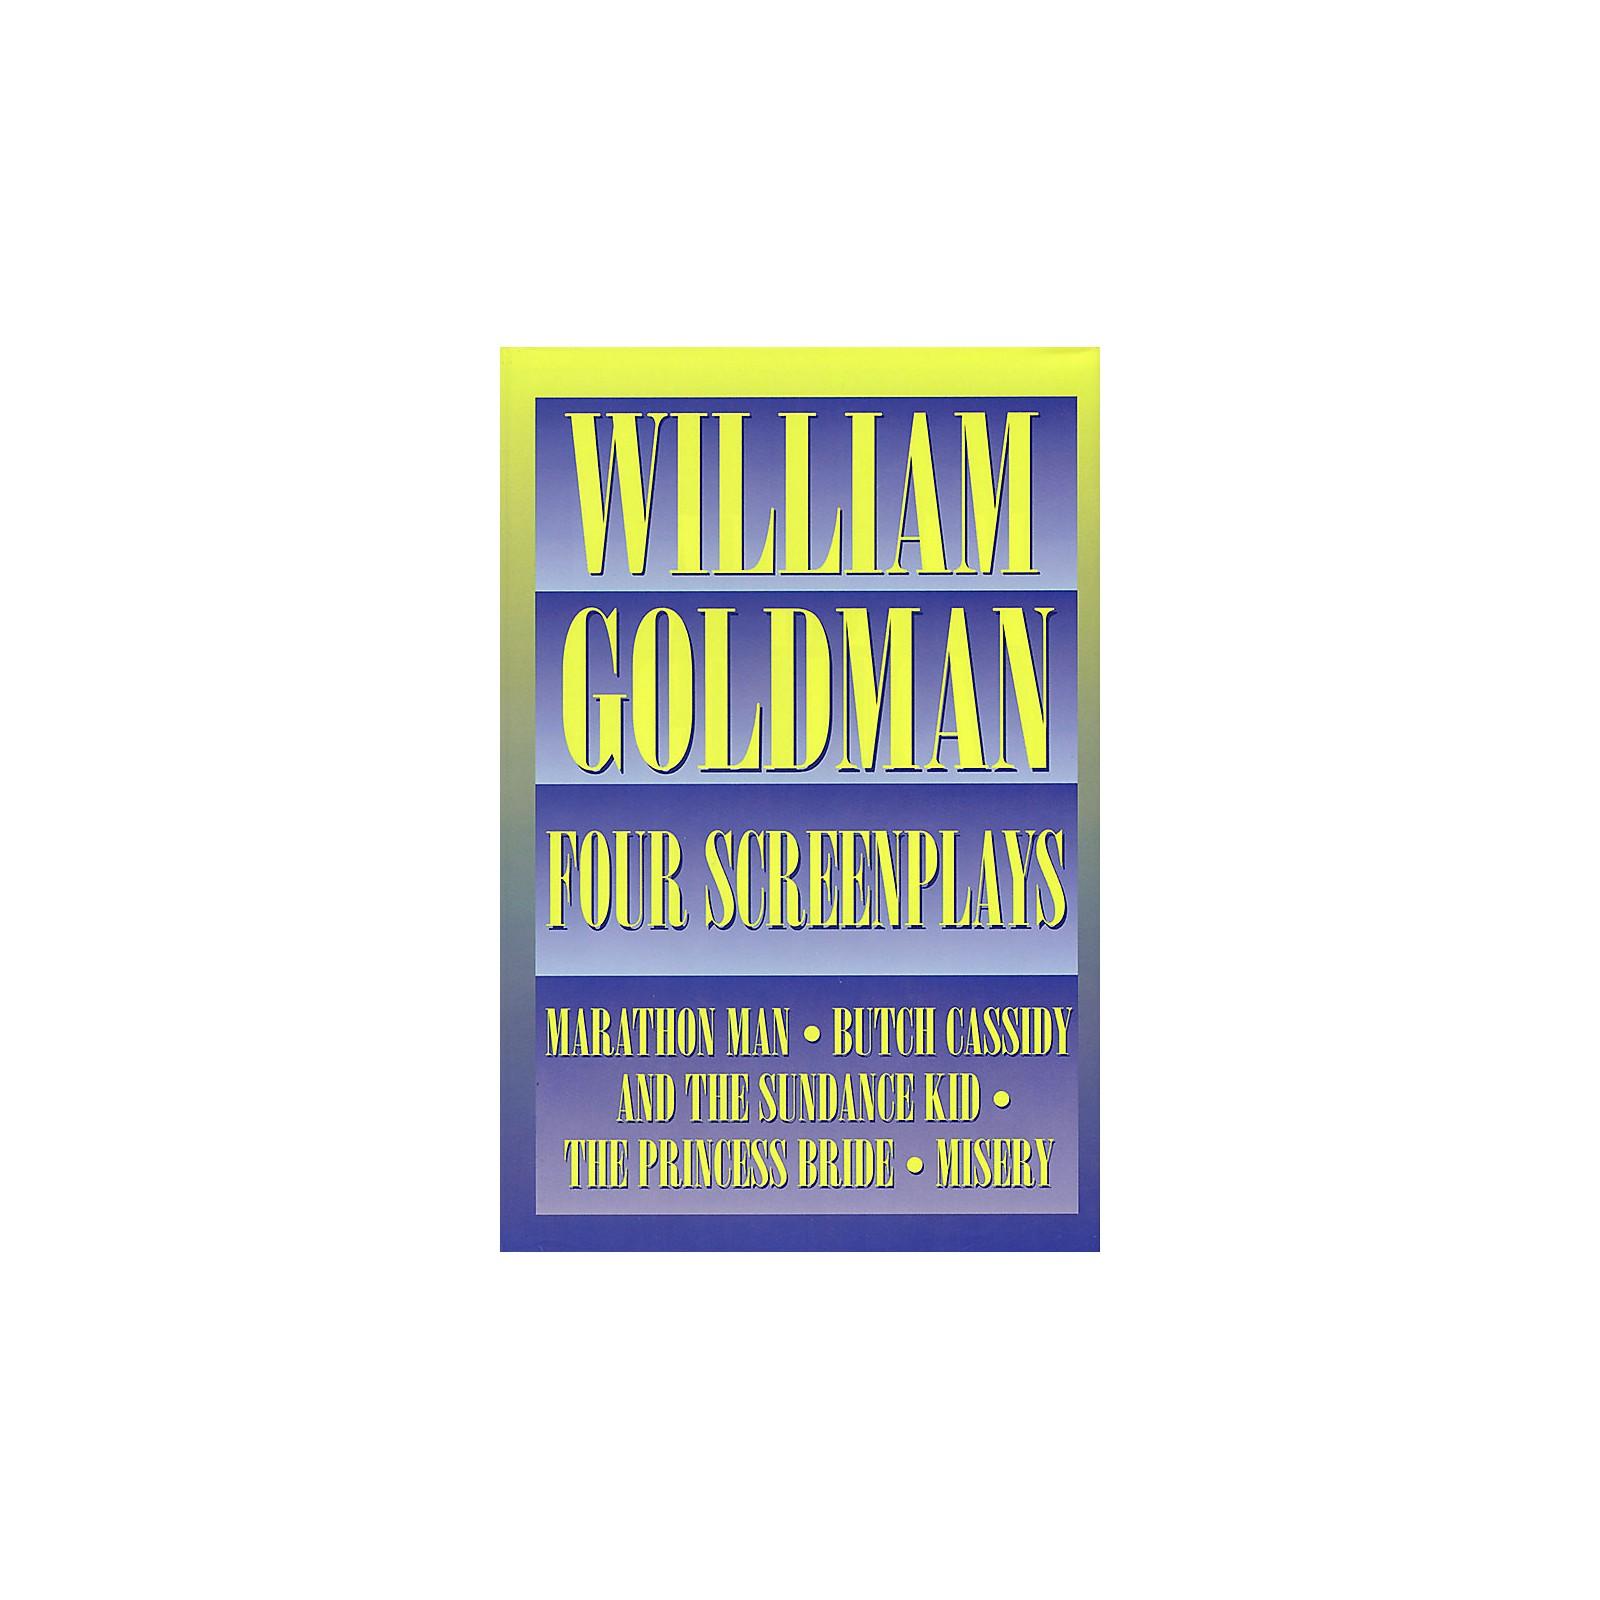 Applause Books William Goldman - Four Screenplays Applause Books Series Written by William Goldman